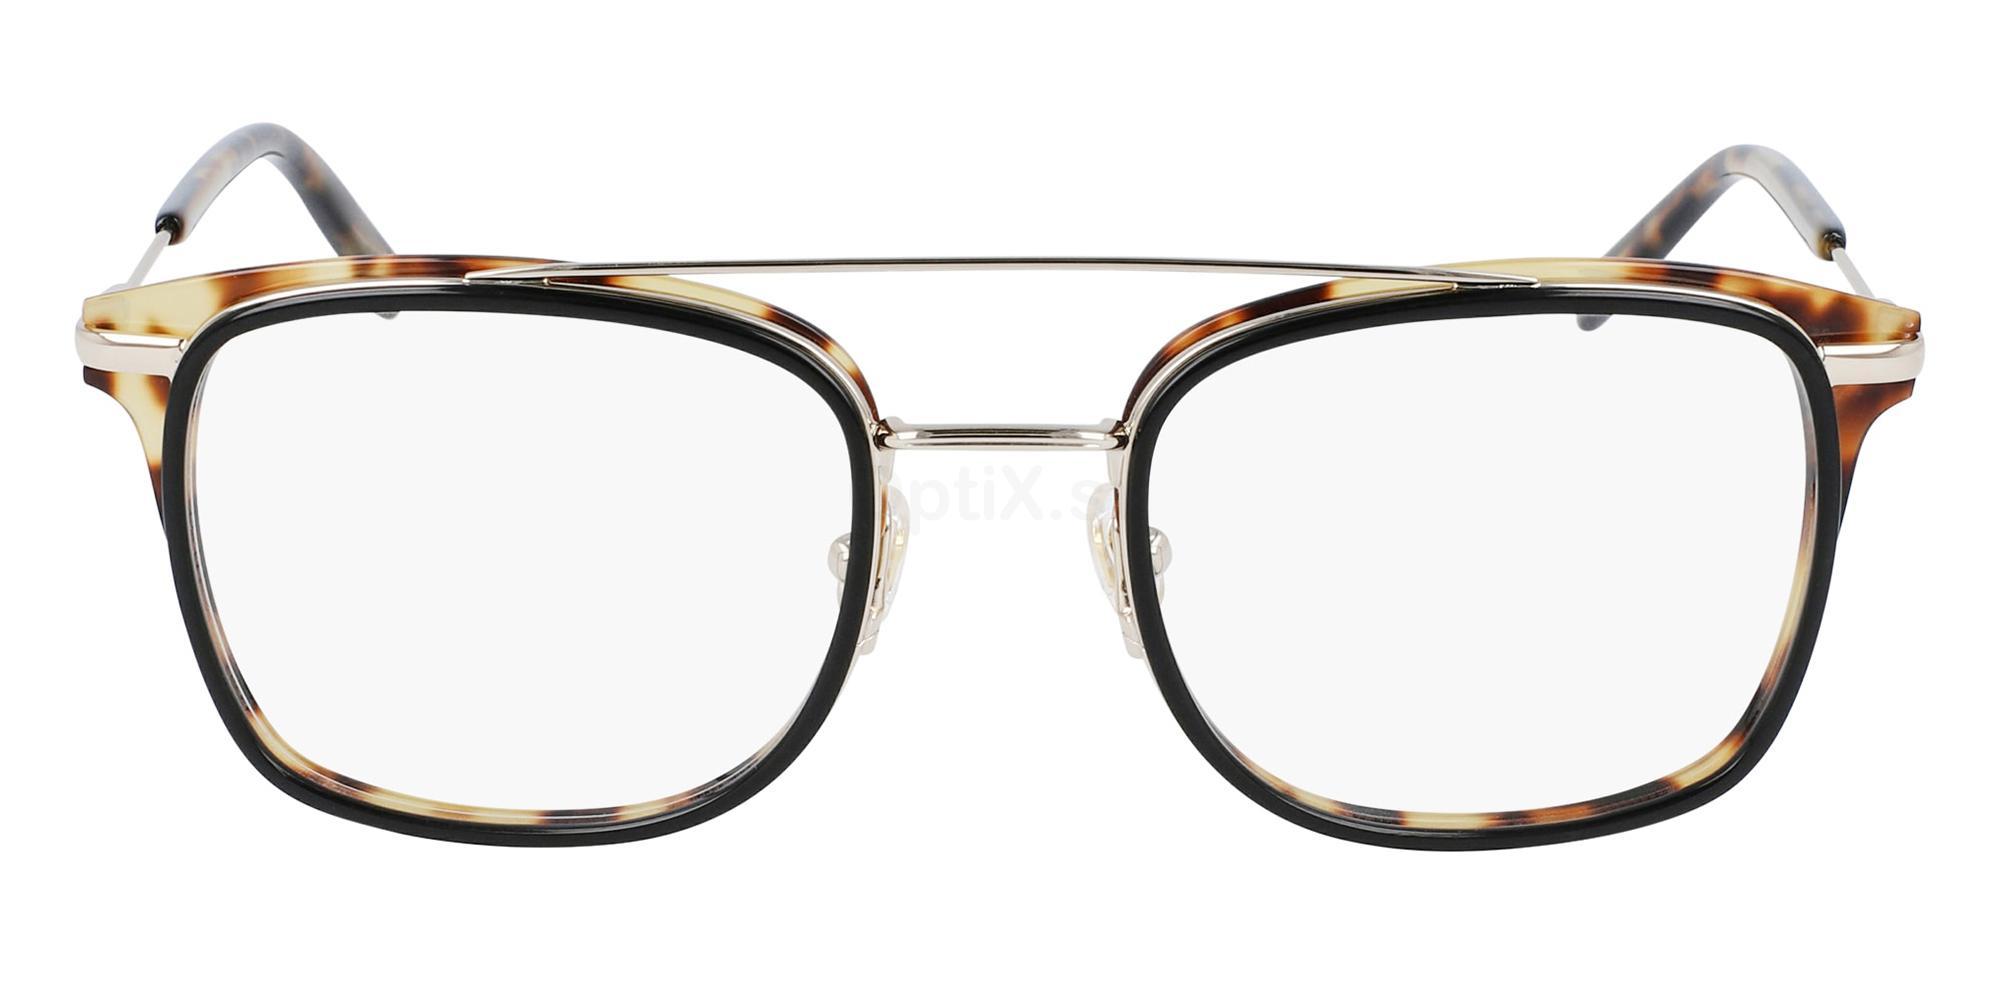 019 MCM2145 Glasses, MCM